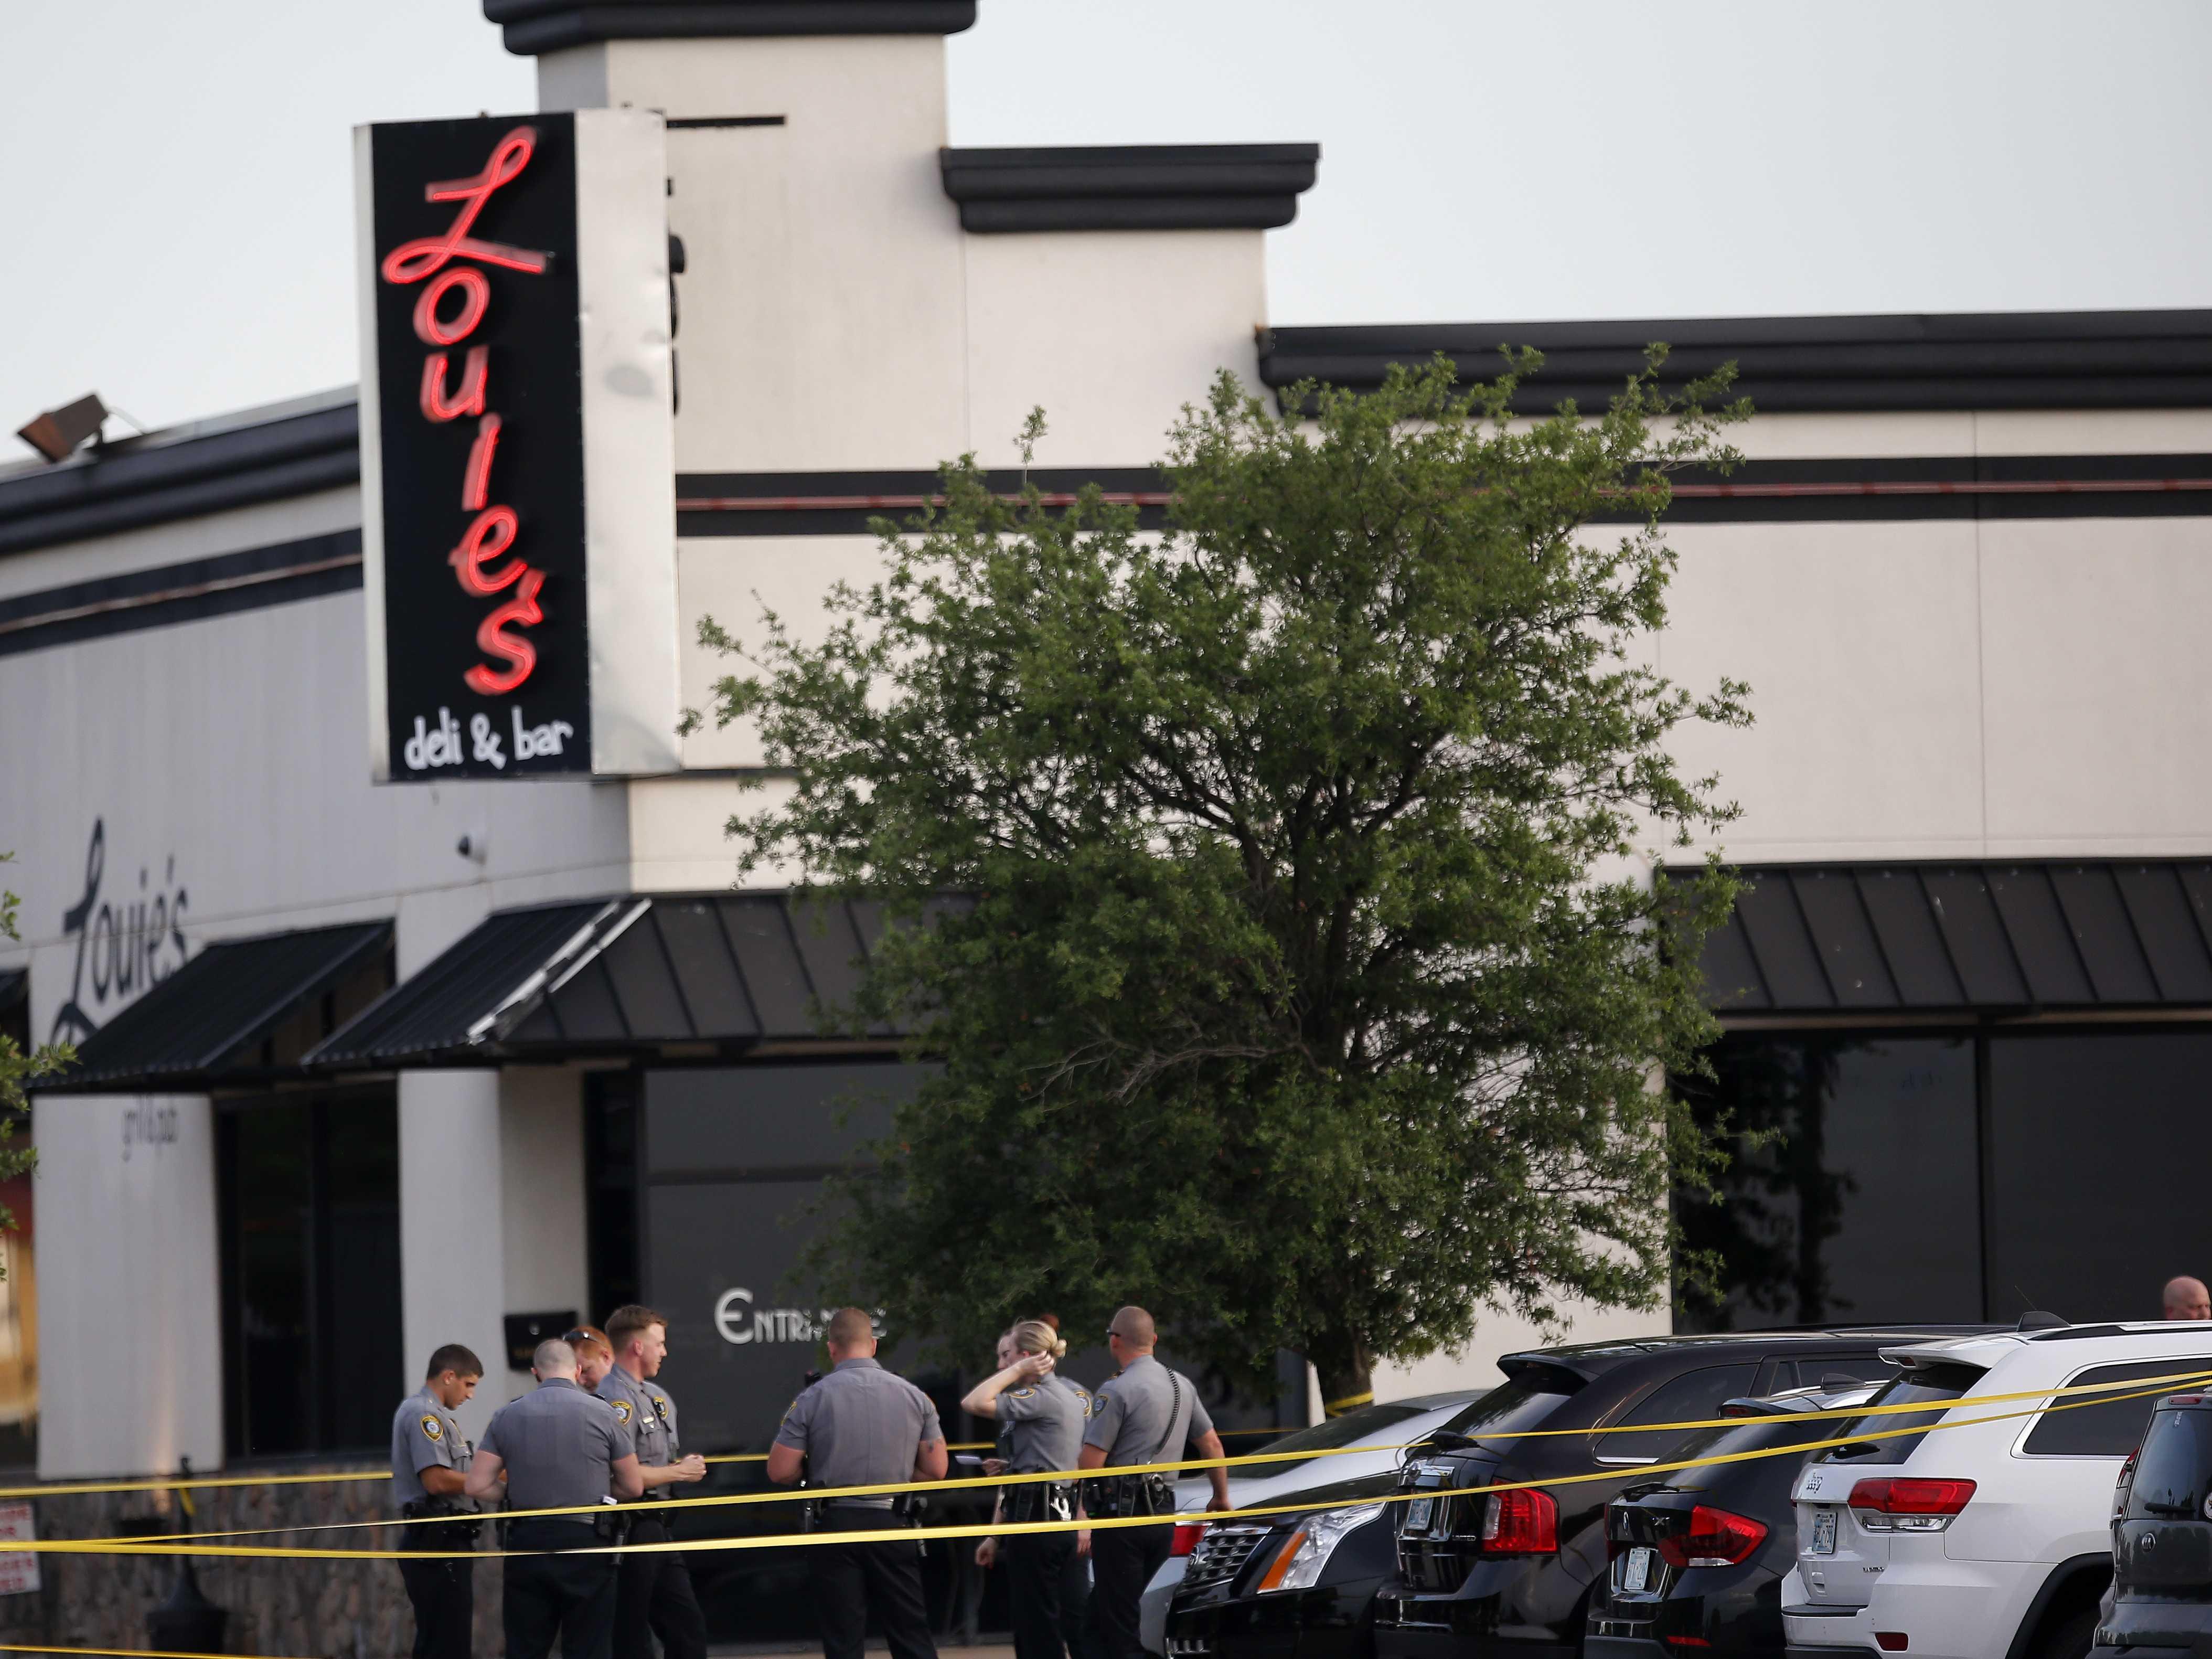 Police: Suspected Gunman Spoke Online About Demon possession